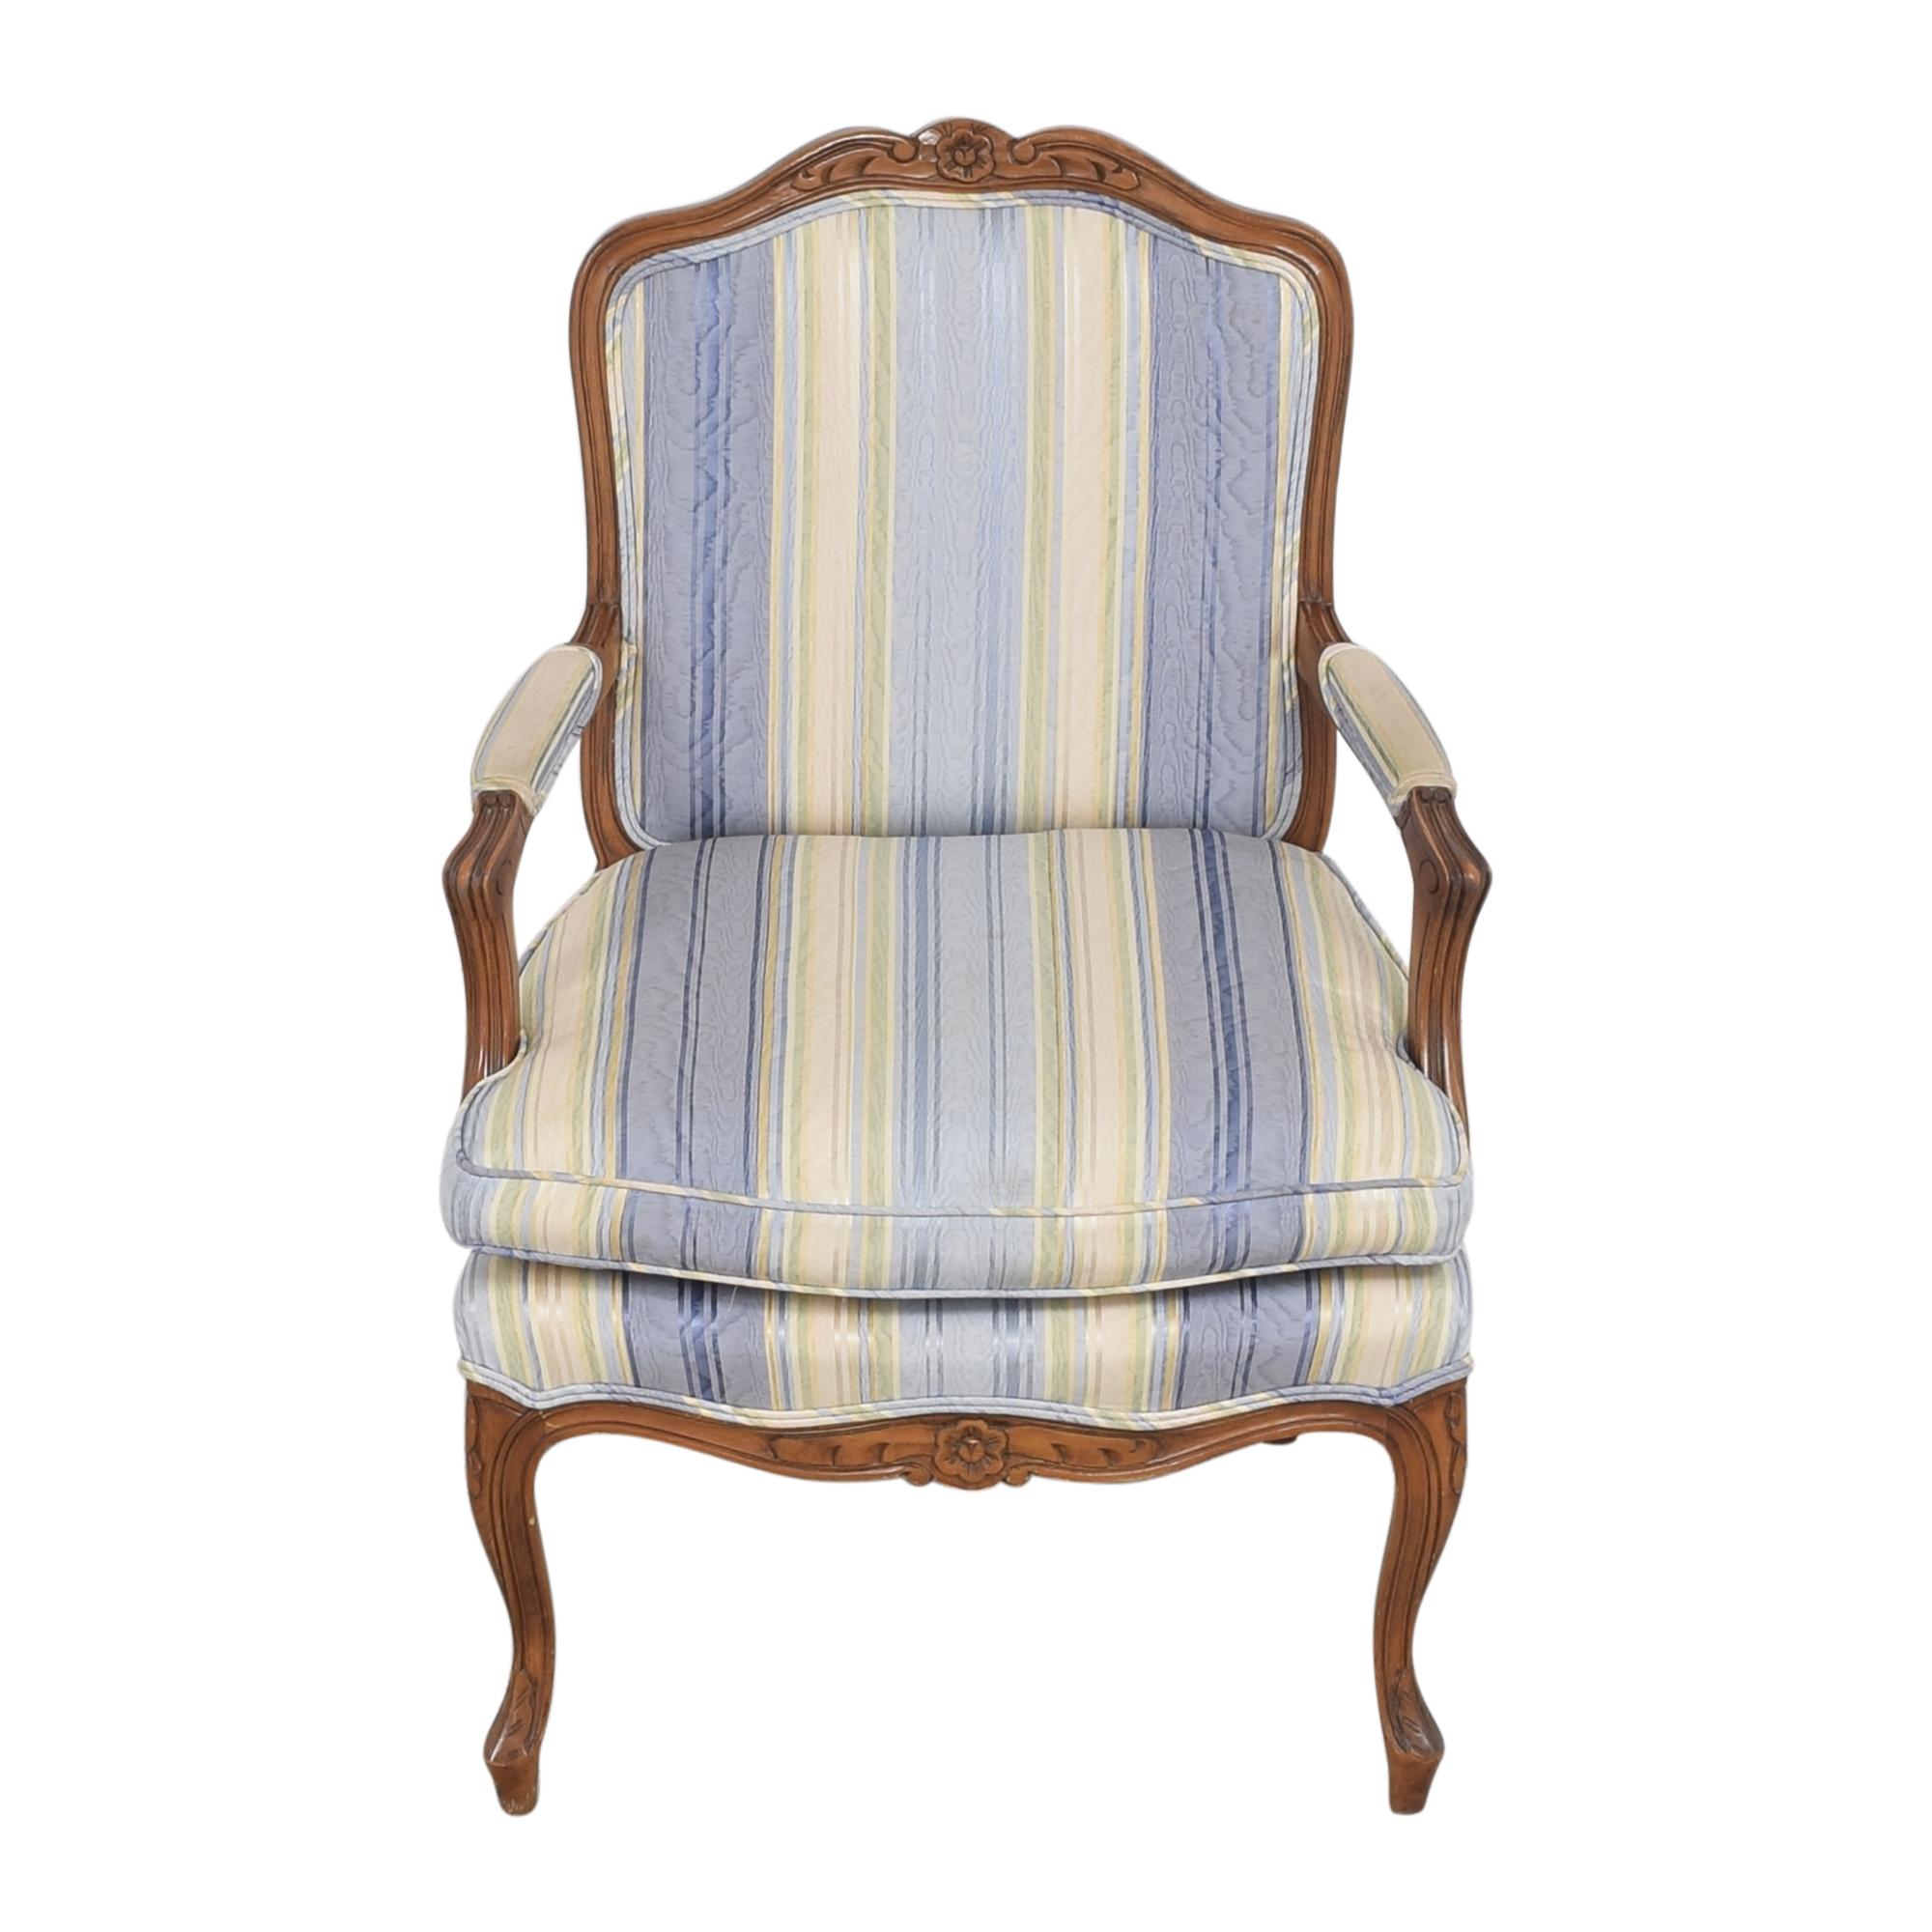 Ethan Allen Ethan Allen Accent Chair multi